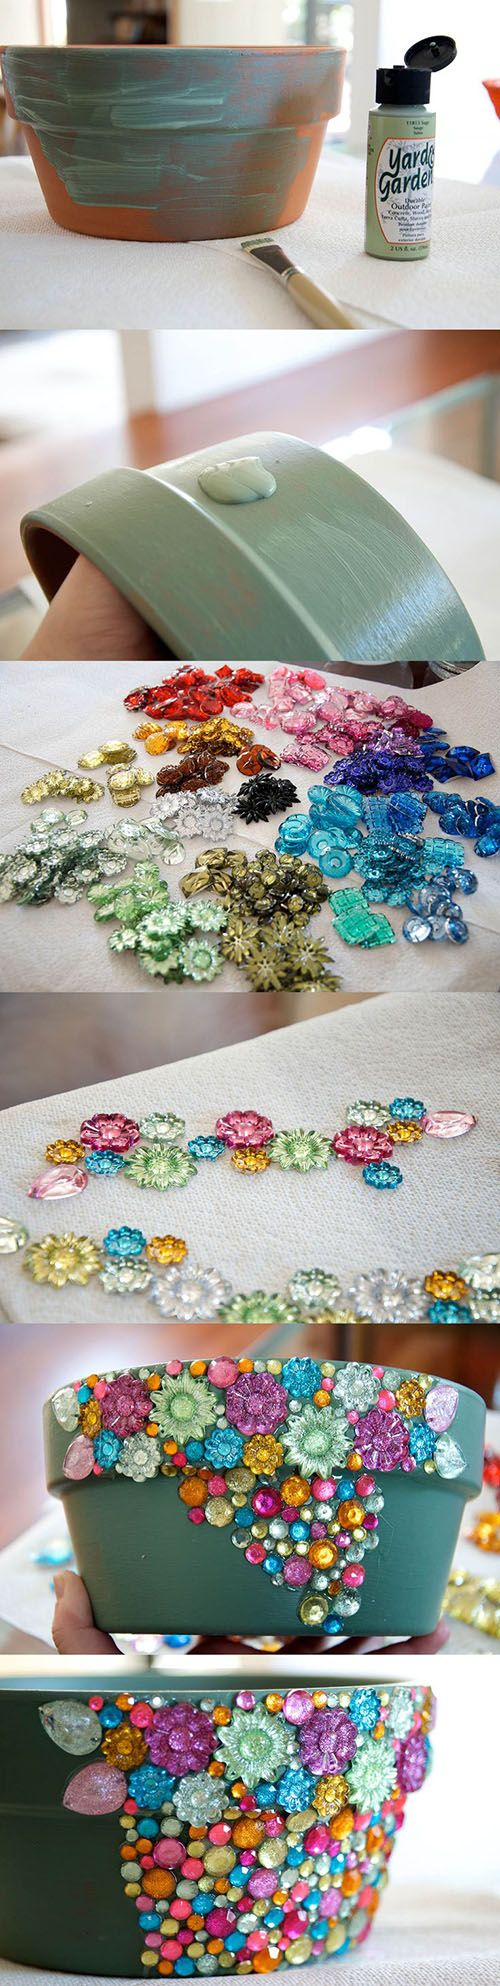 How To Make a Jeweled Terra Cotta Pot